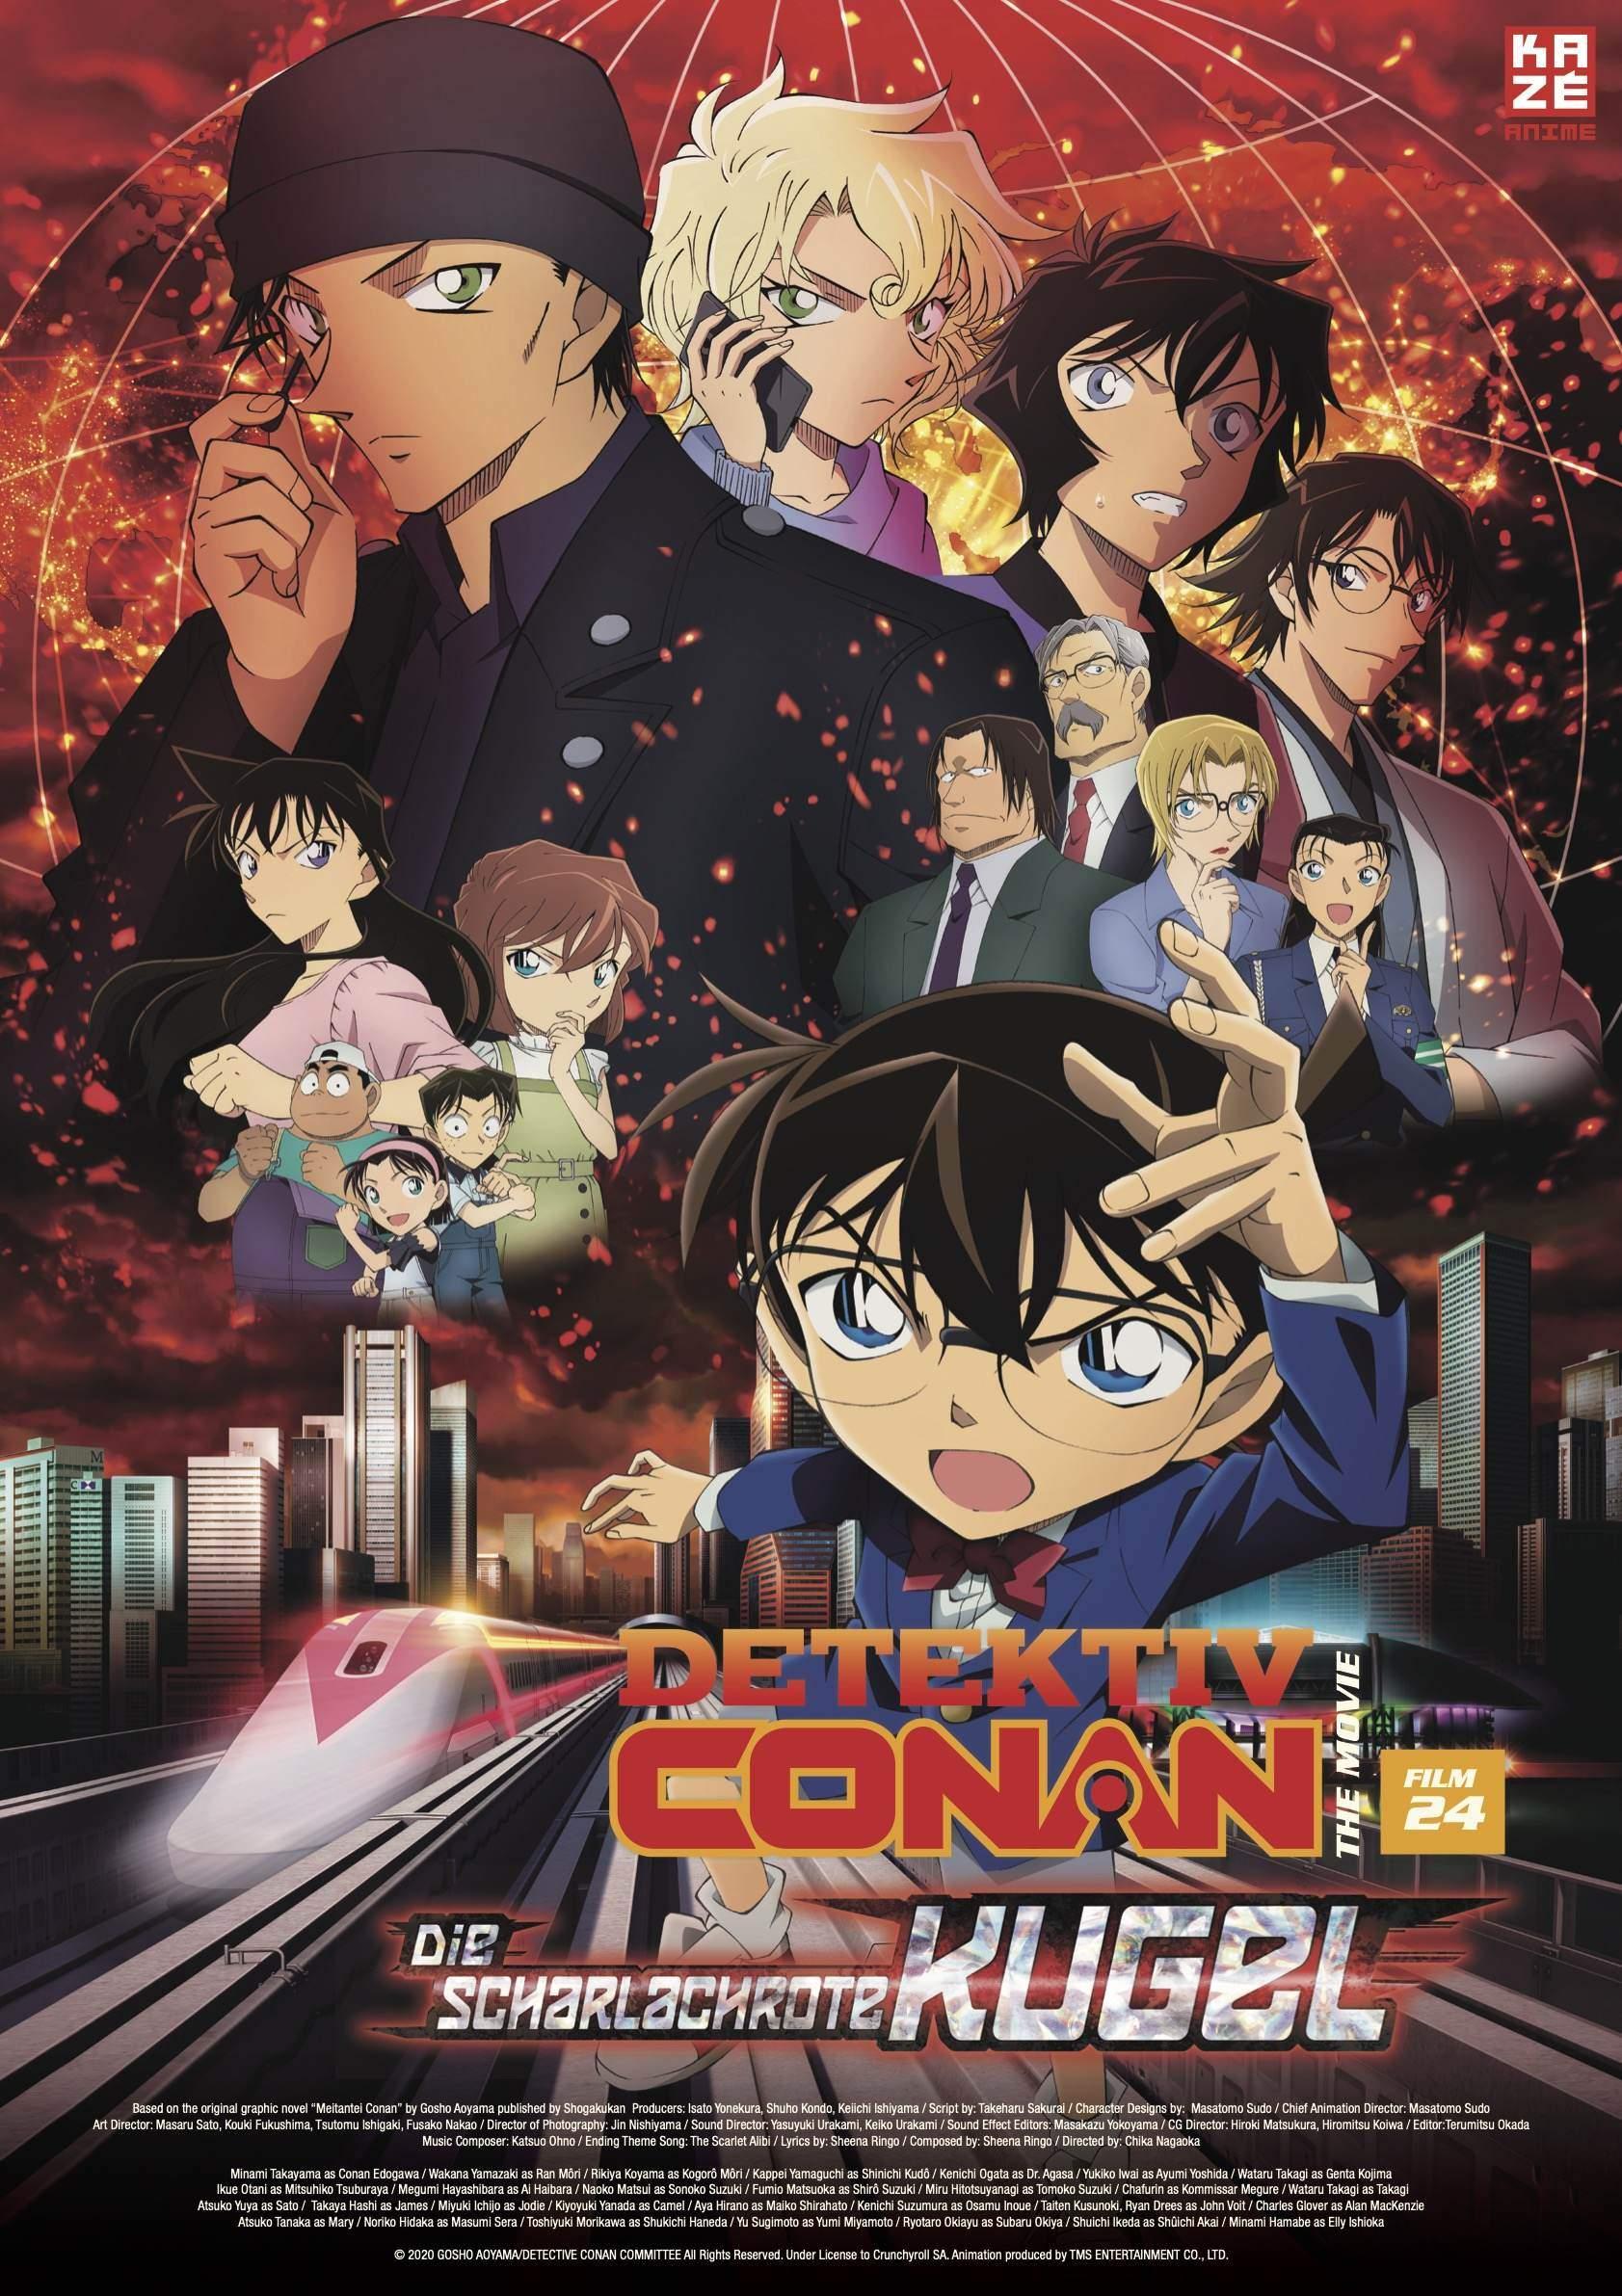 Detektiv_Conan_Movie24_Plakat_A1_FINAL.jpg